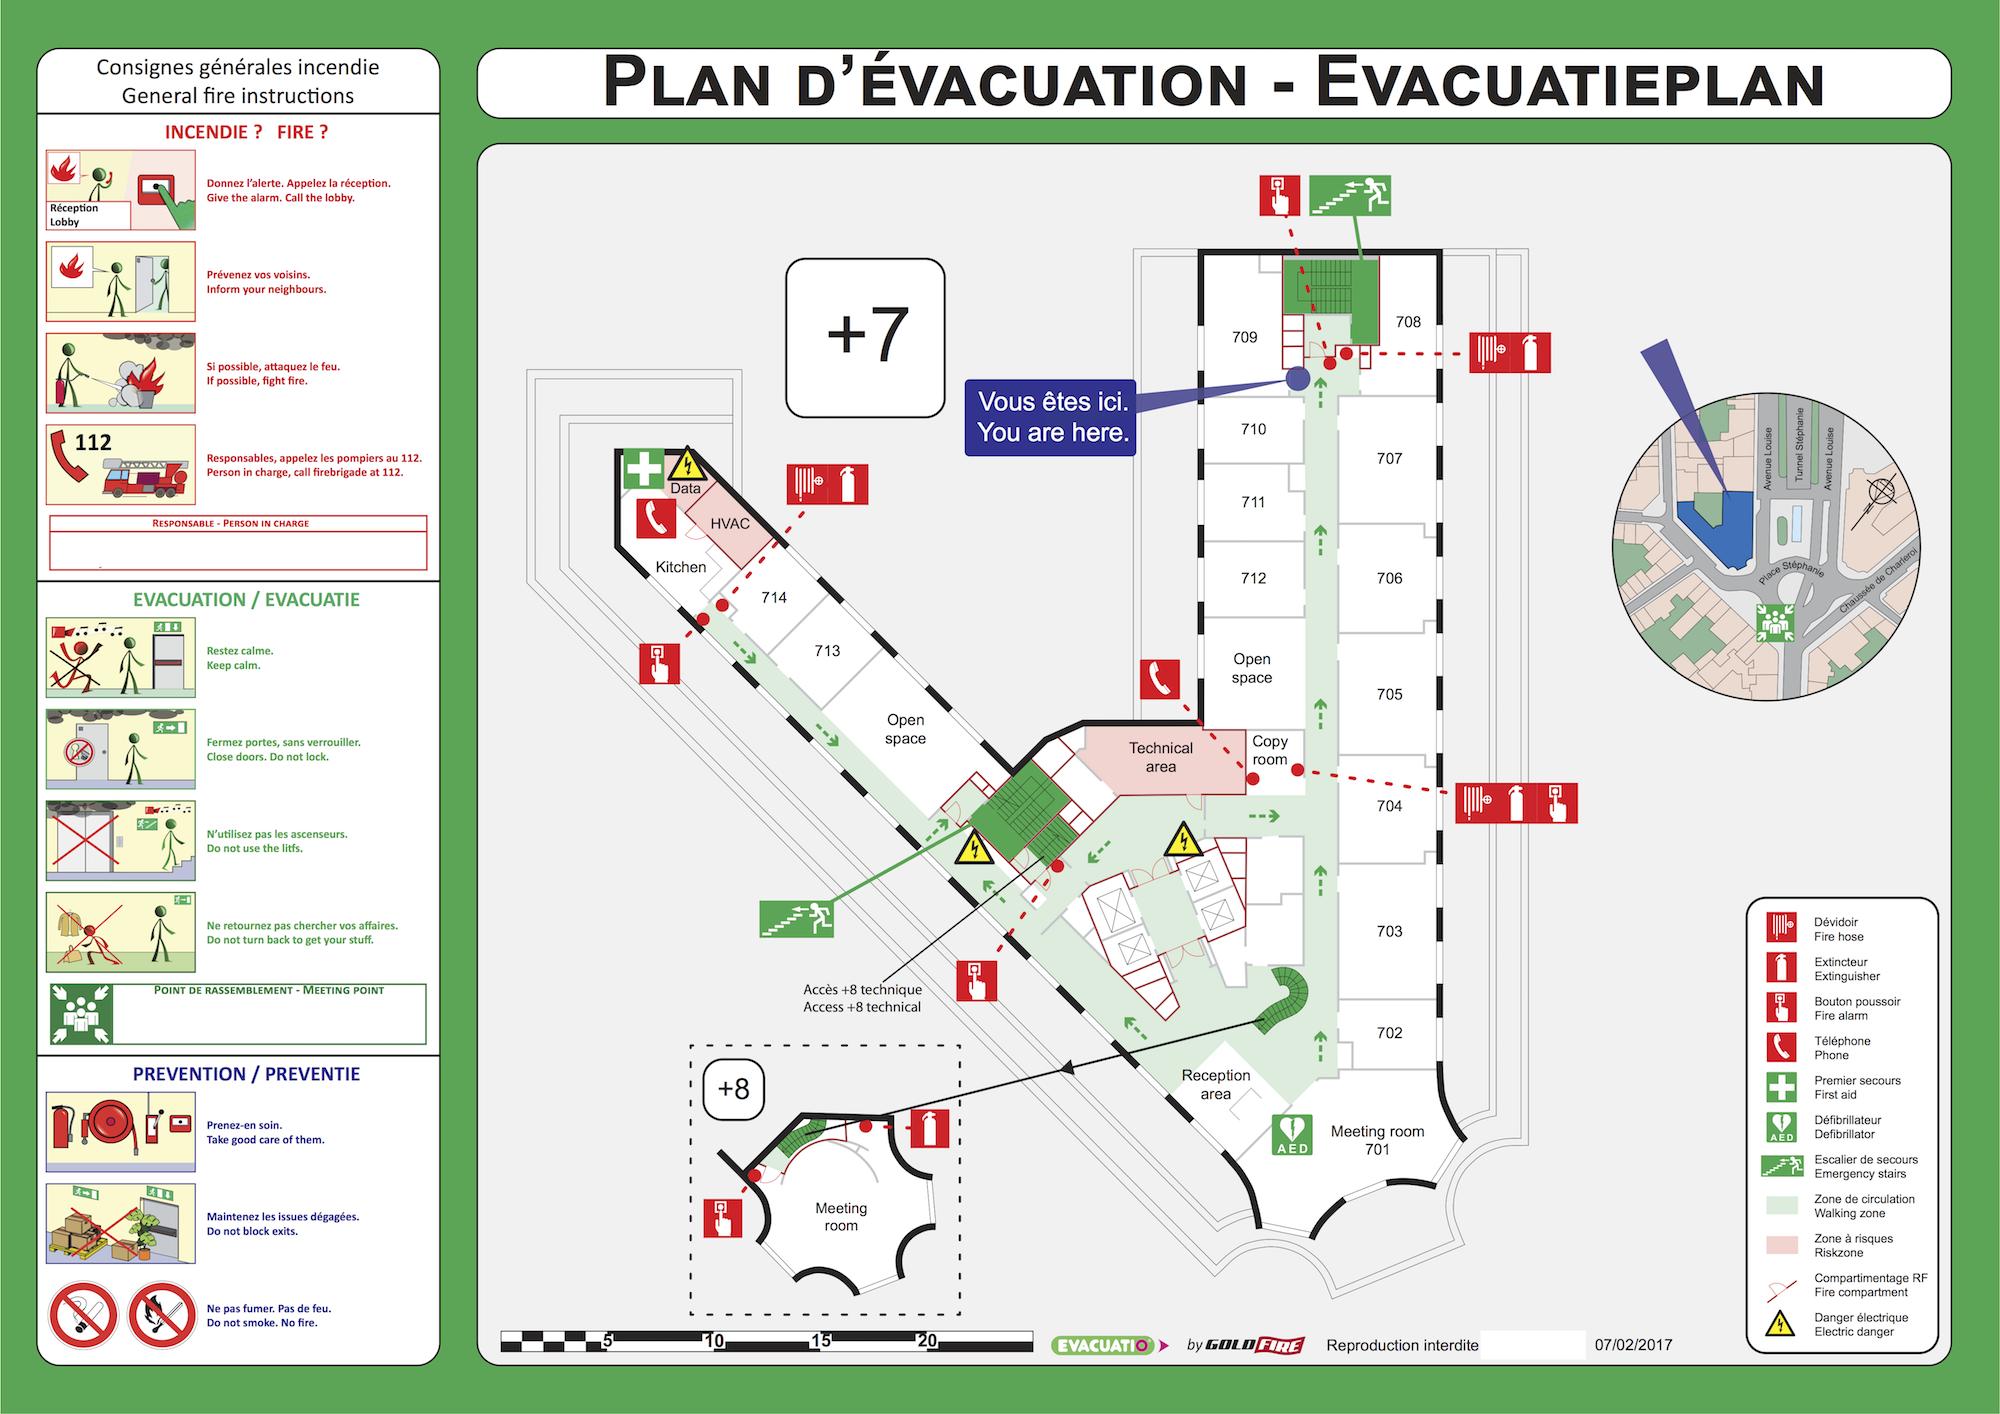 evacuatio exemples de plans d 39 vacuation. Black Bedroom Furniture Sets. Home Design Ideas